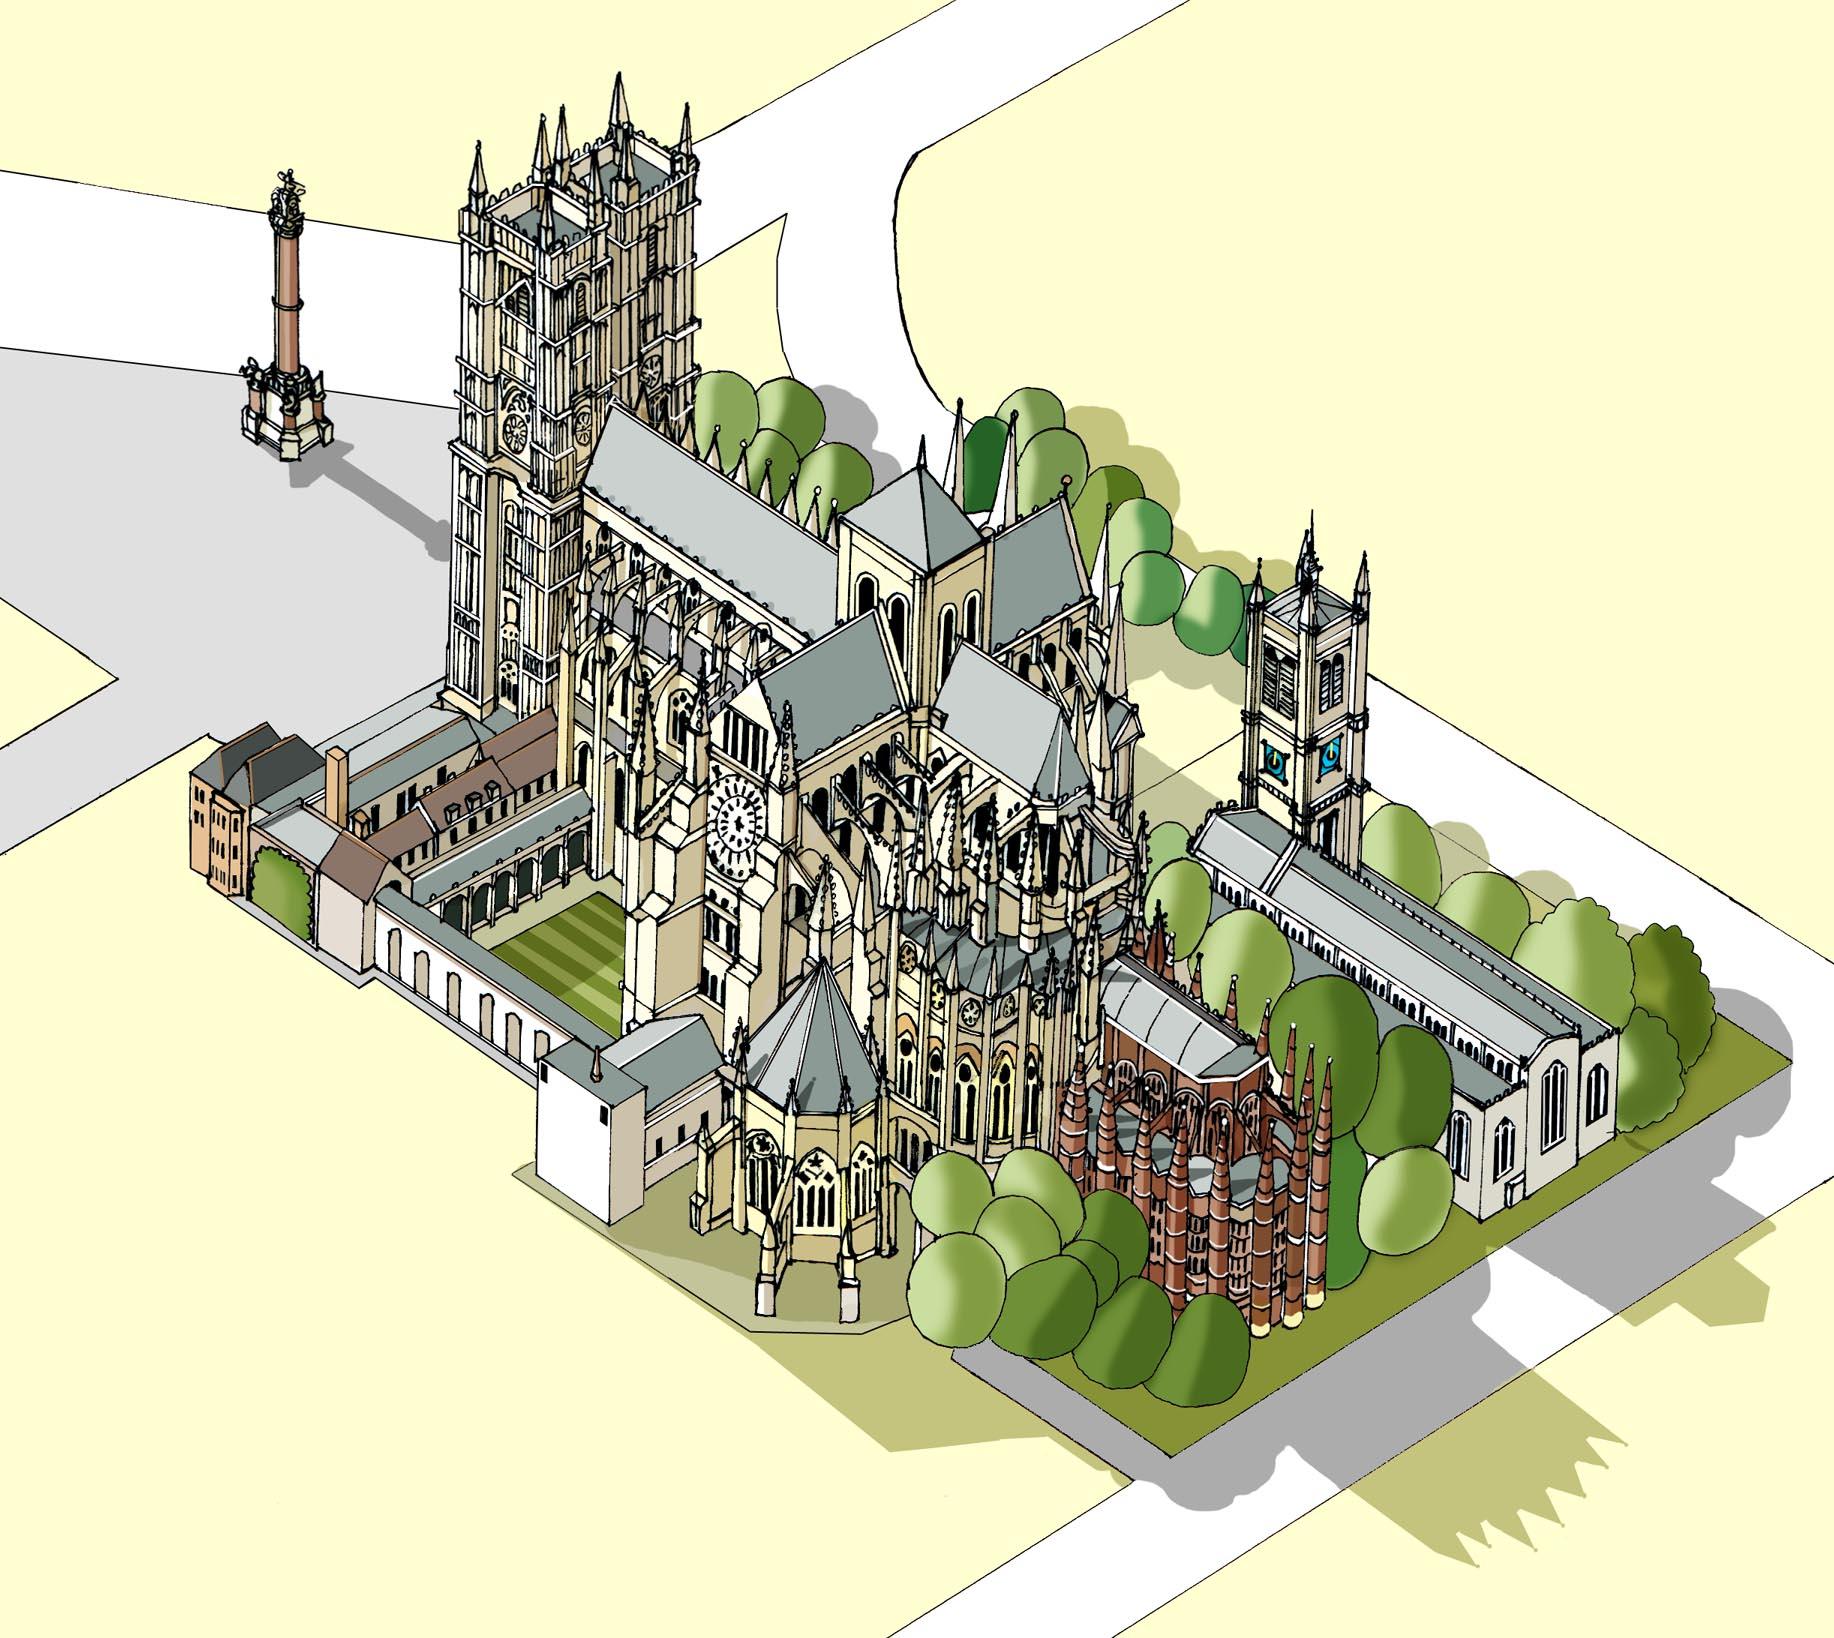 Westminster Abbey  Illustration by Katherine Baxter